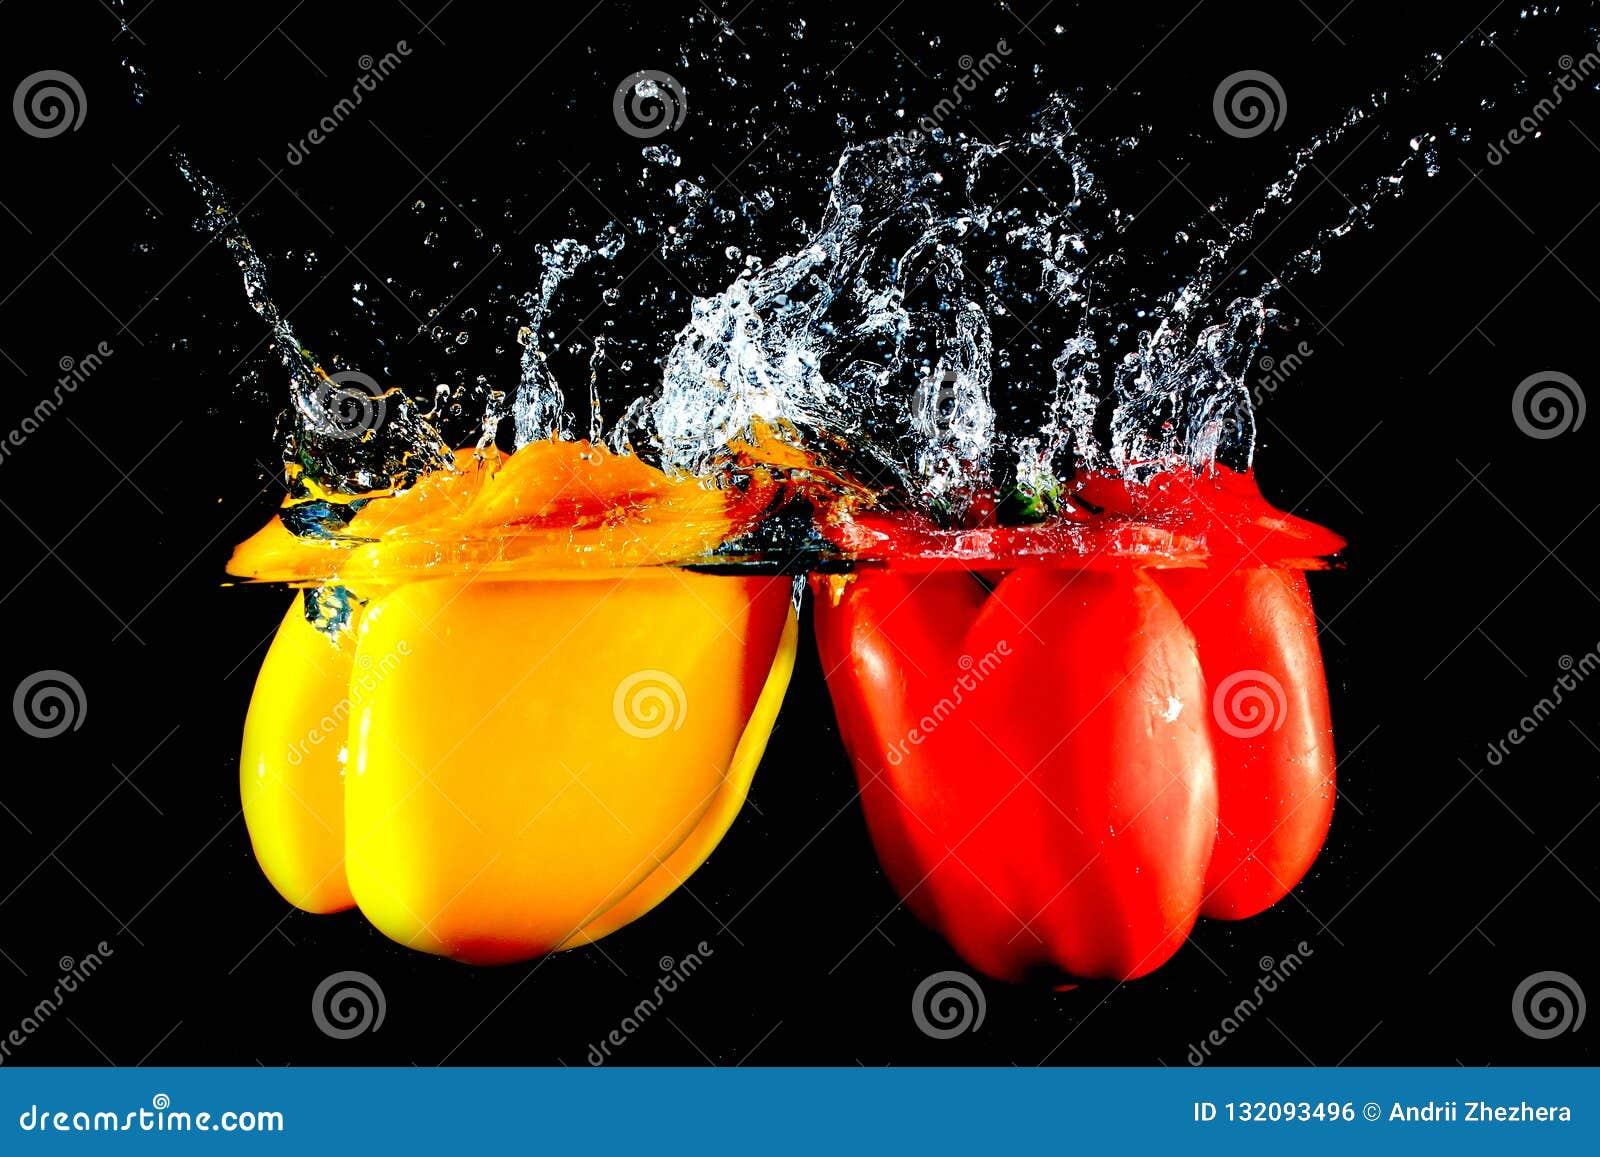 Rode en gele peper die in water vallen